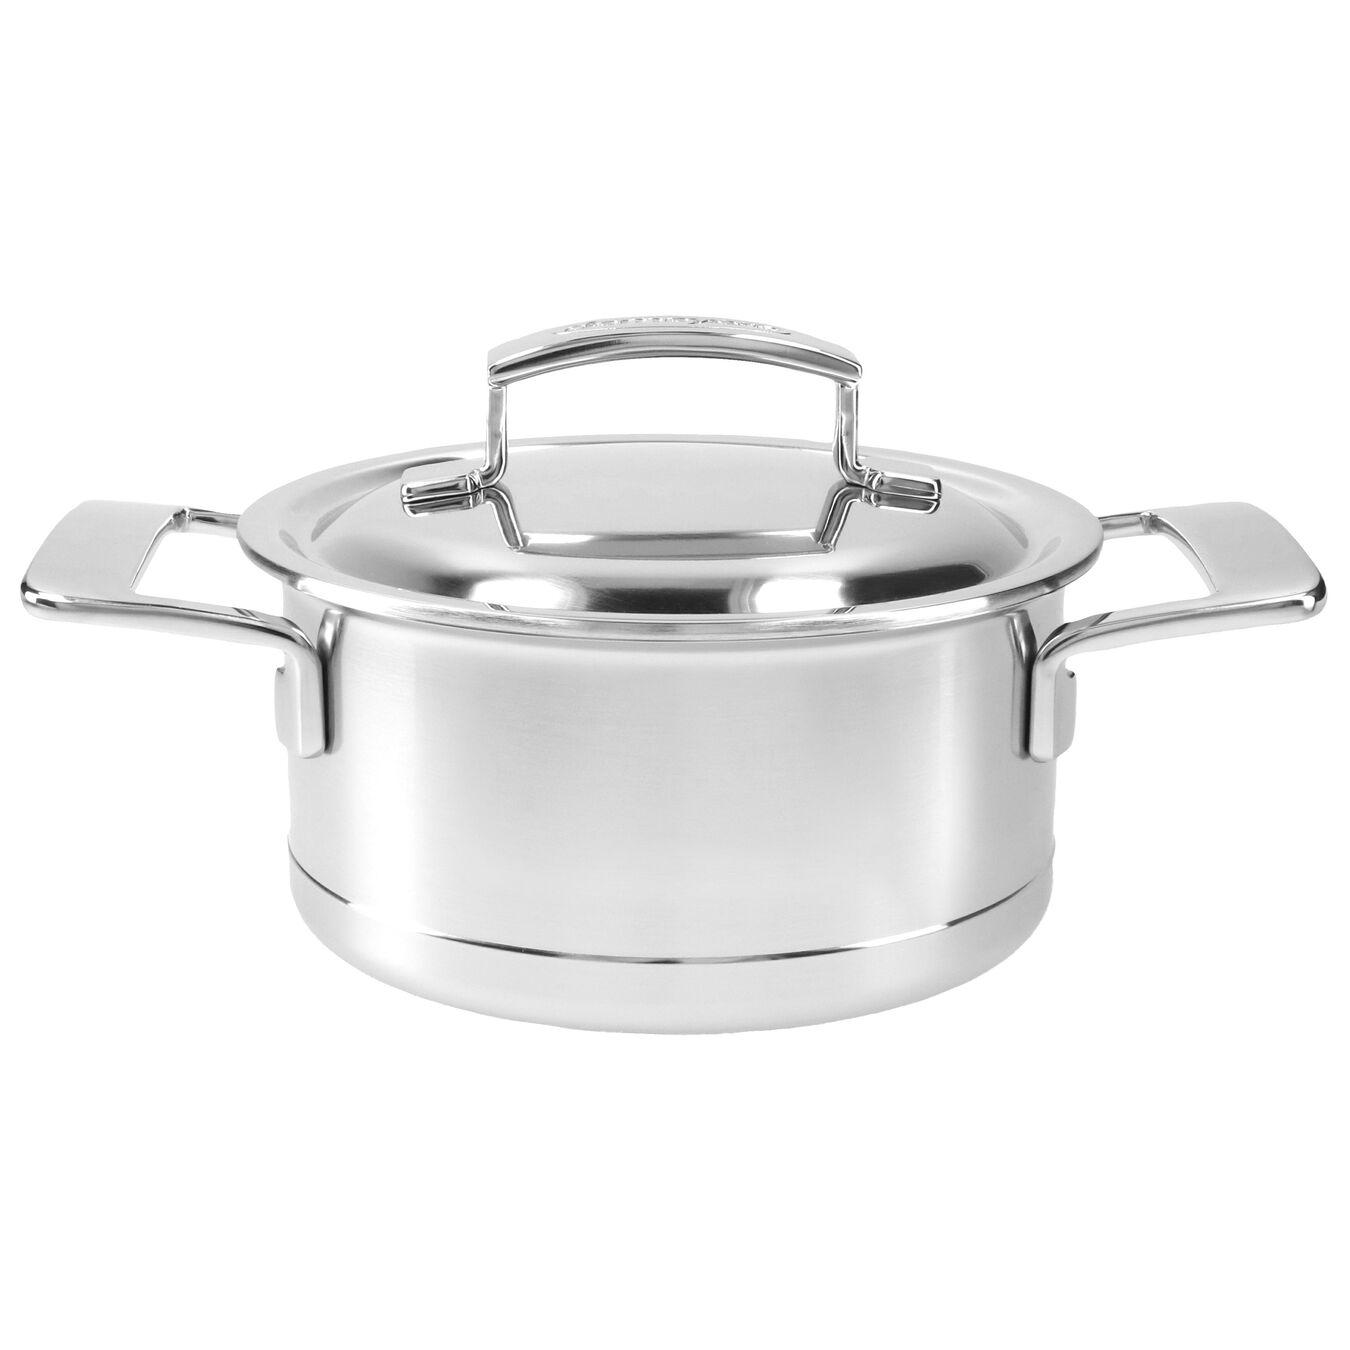 Kookpot met dubbelwandig deksel 16 cm / 1,5 l,,large 1